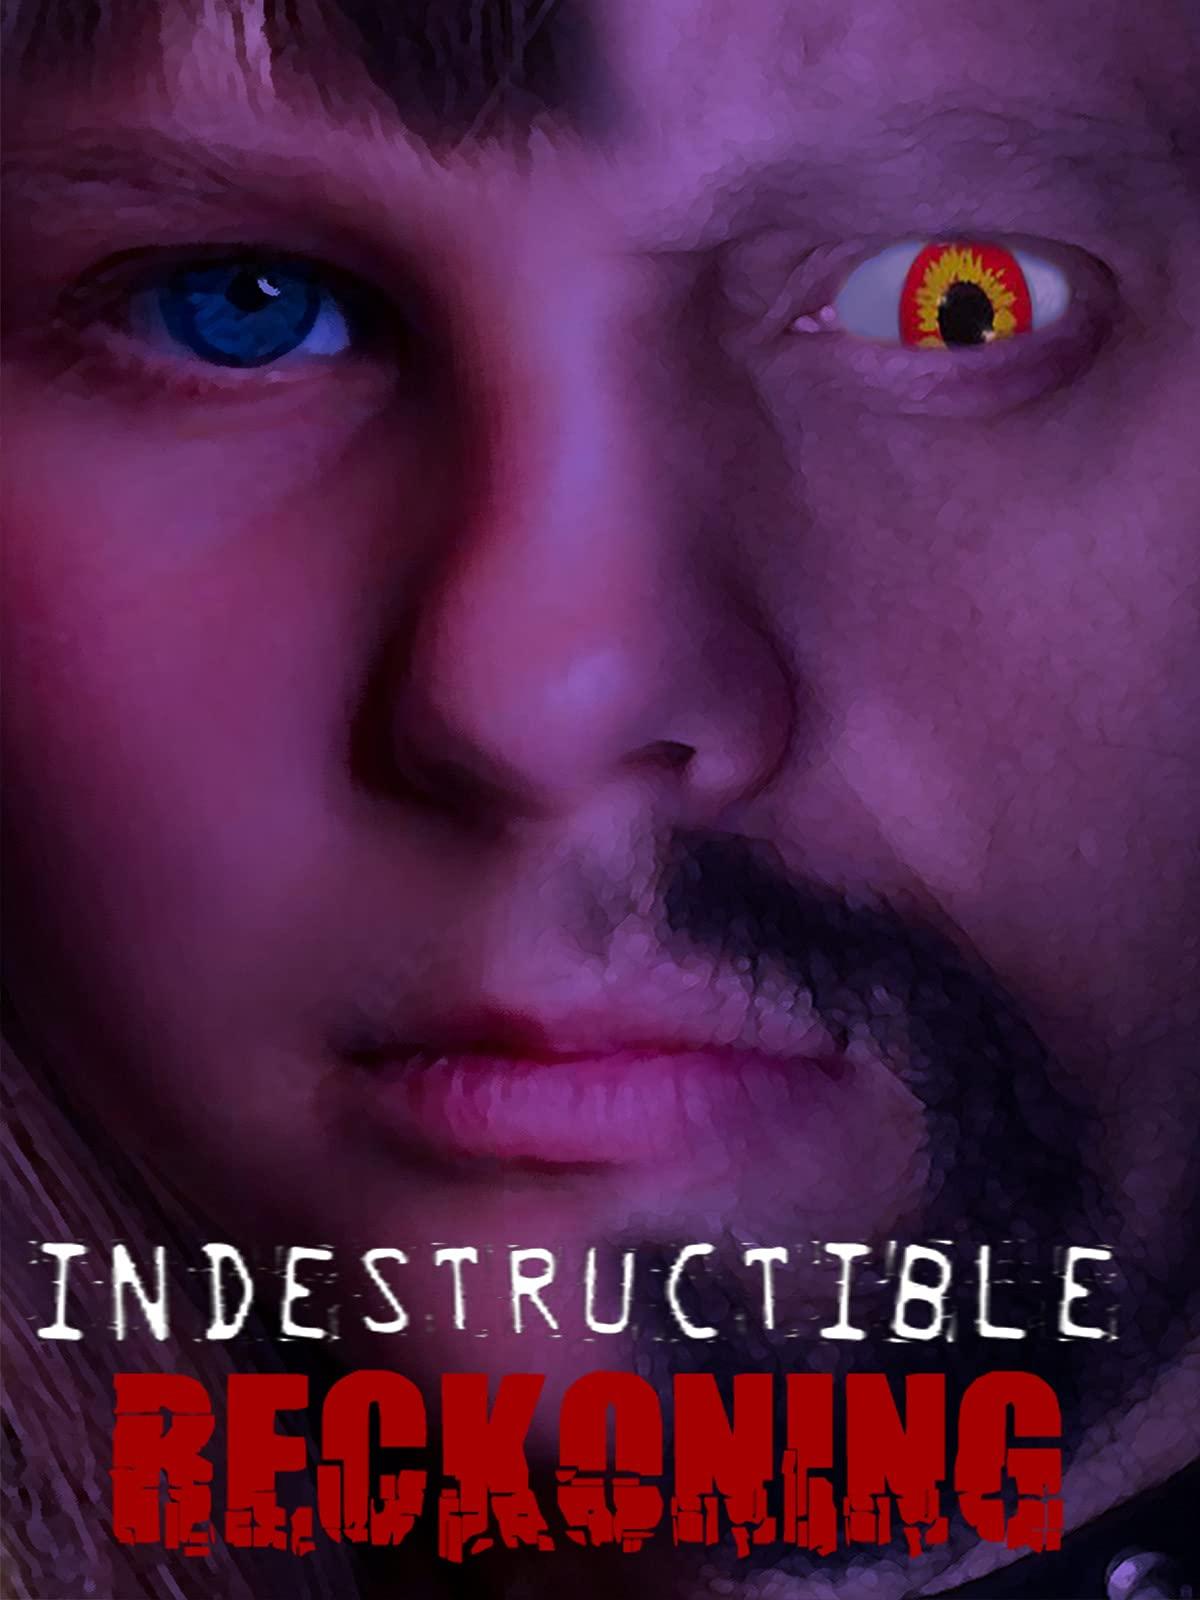 Indestructible: Reckoning